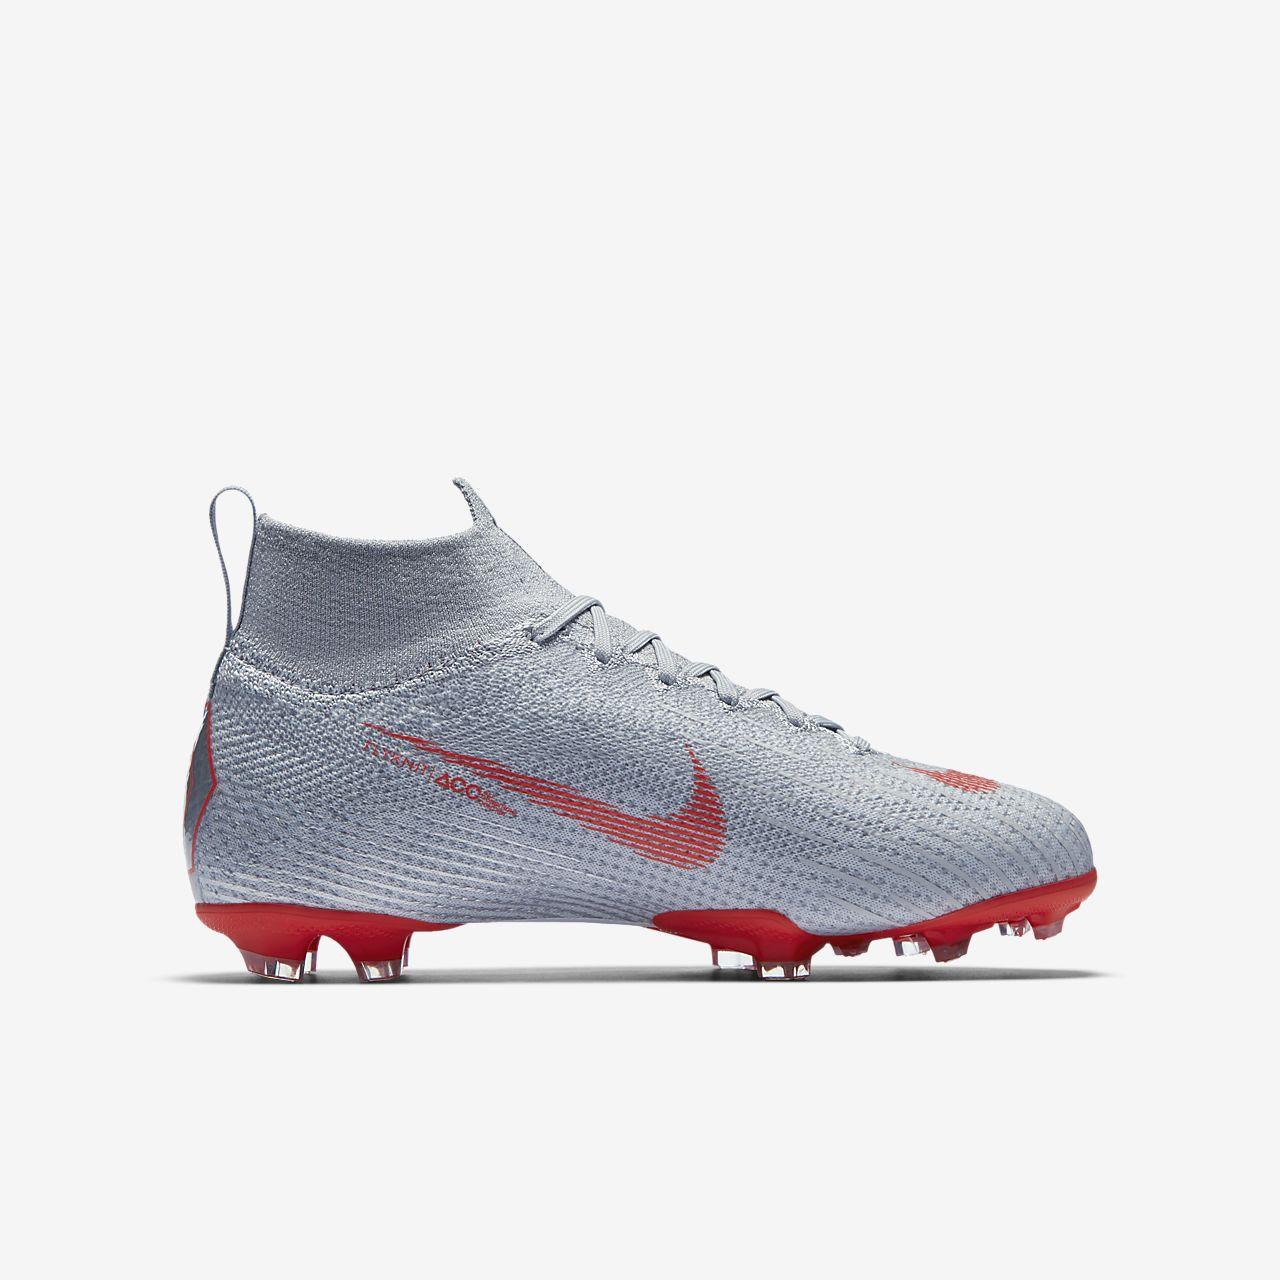 62a1016da ... Nike Jr. Mercurial Superfly 360 Elite Older Kids  Firm-Ground Football  Boot